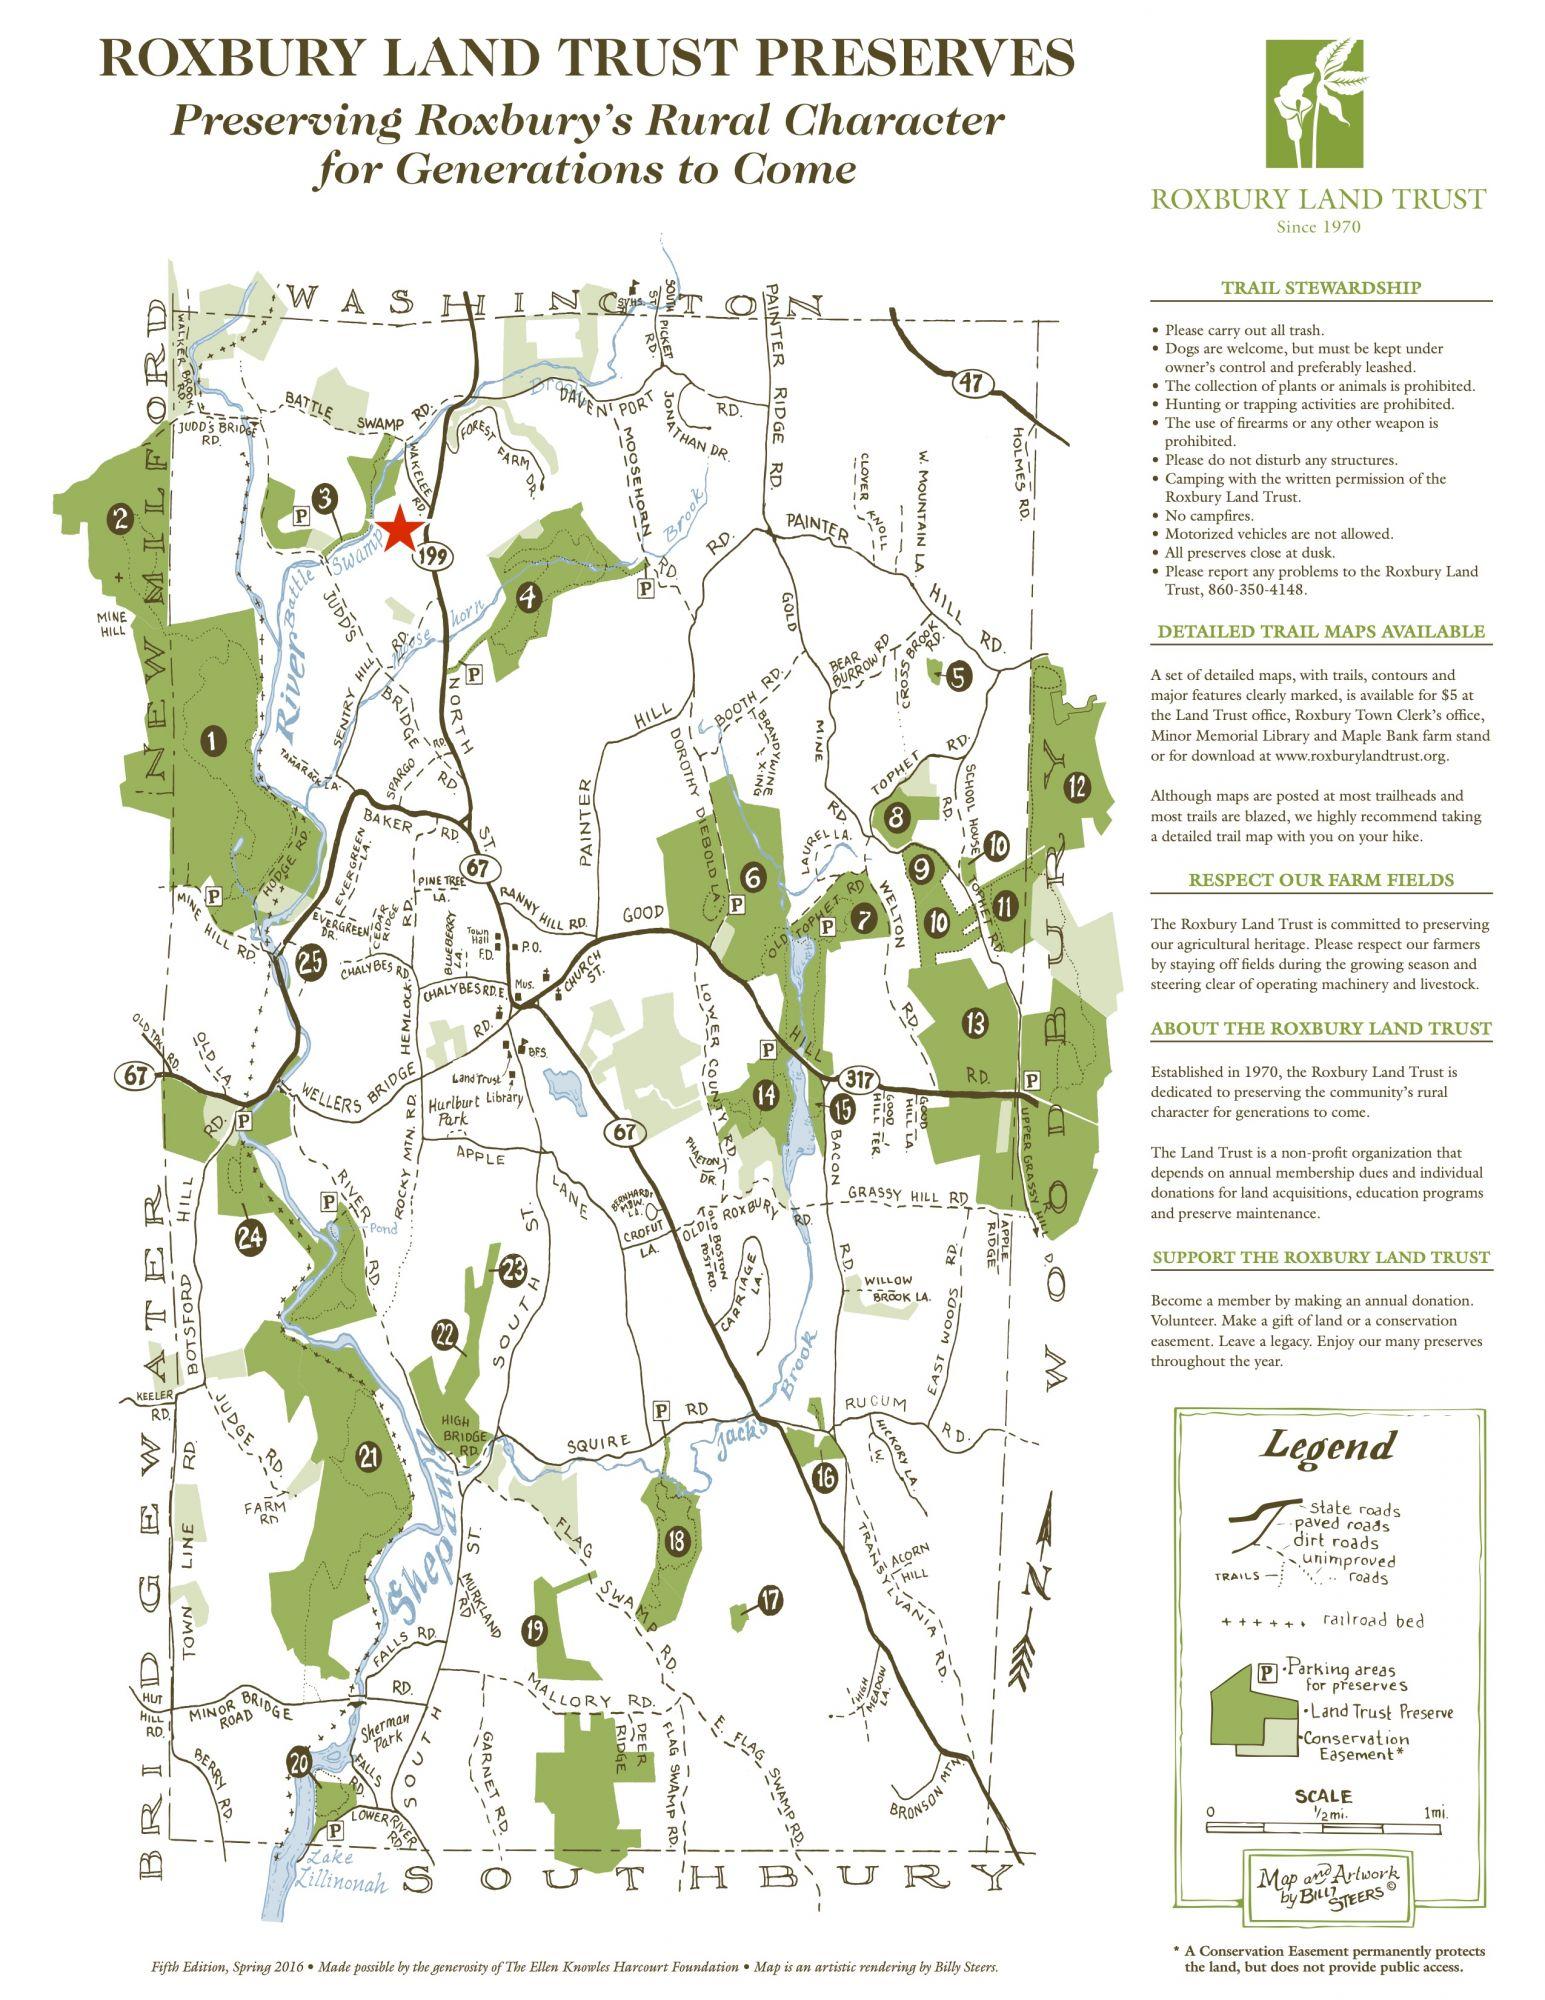 Roxbury Land Trust Preserves